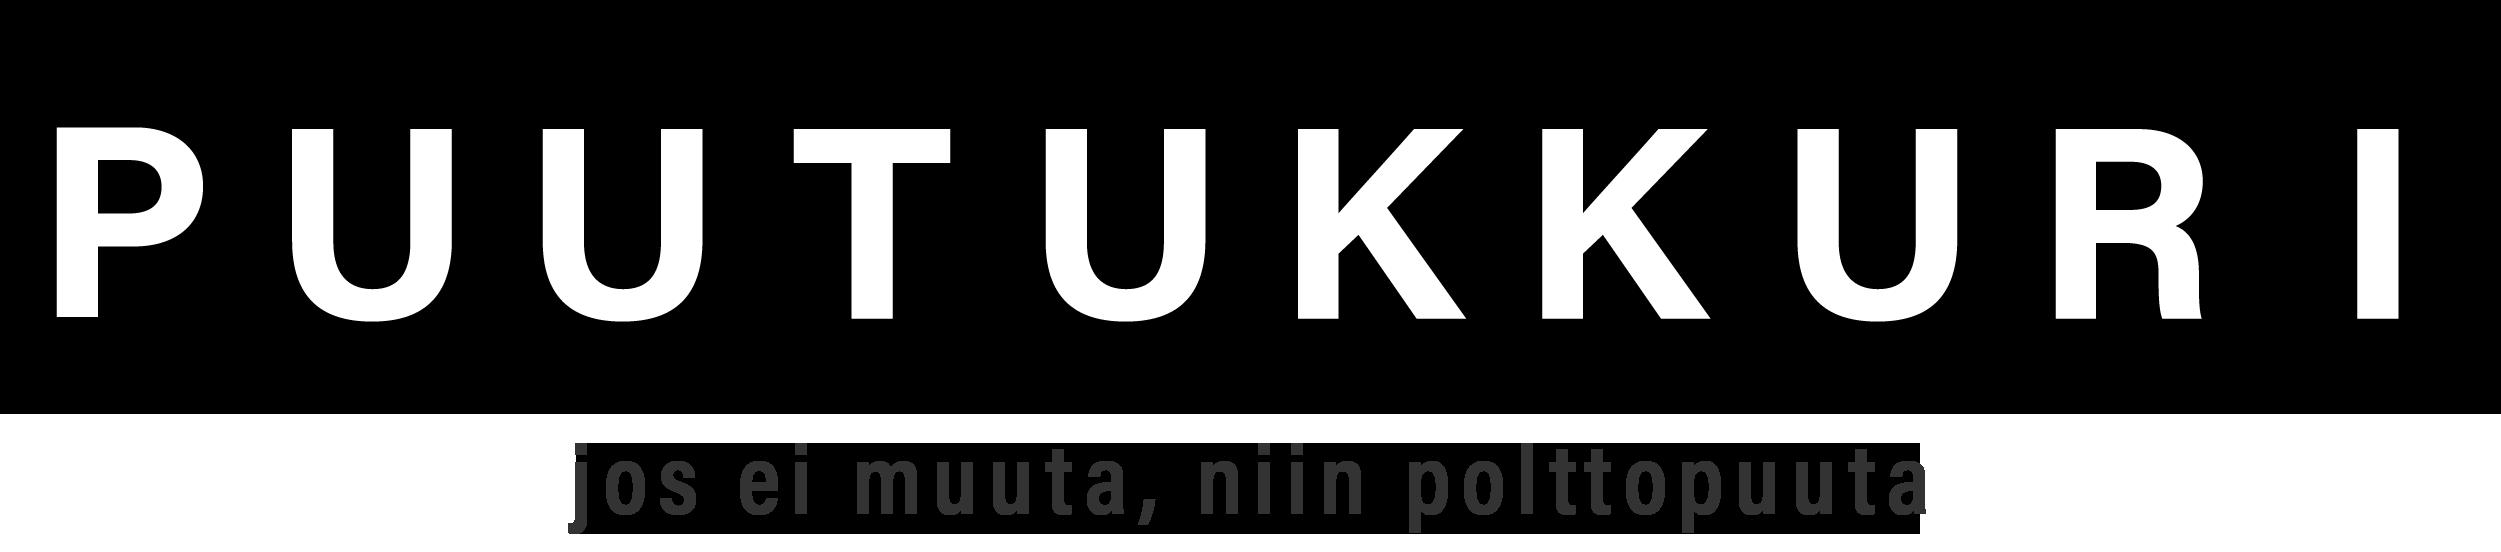 Puutukkuri.fi